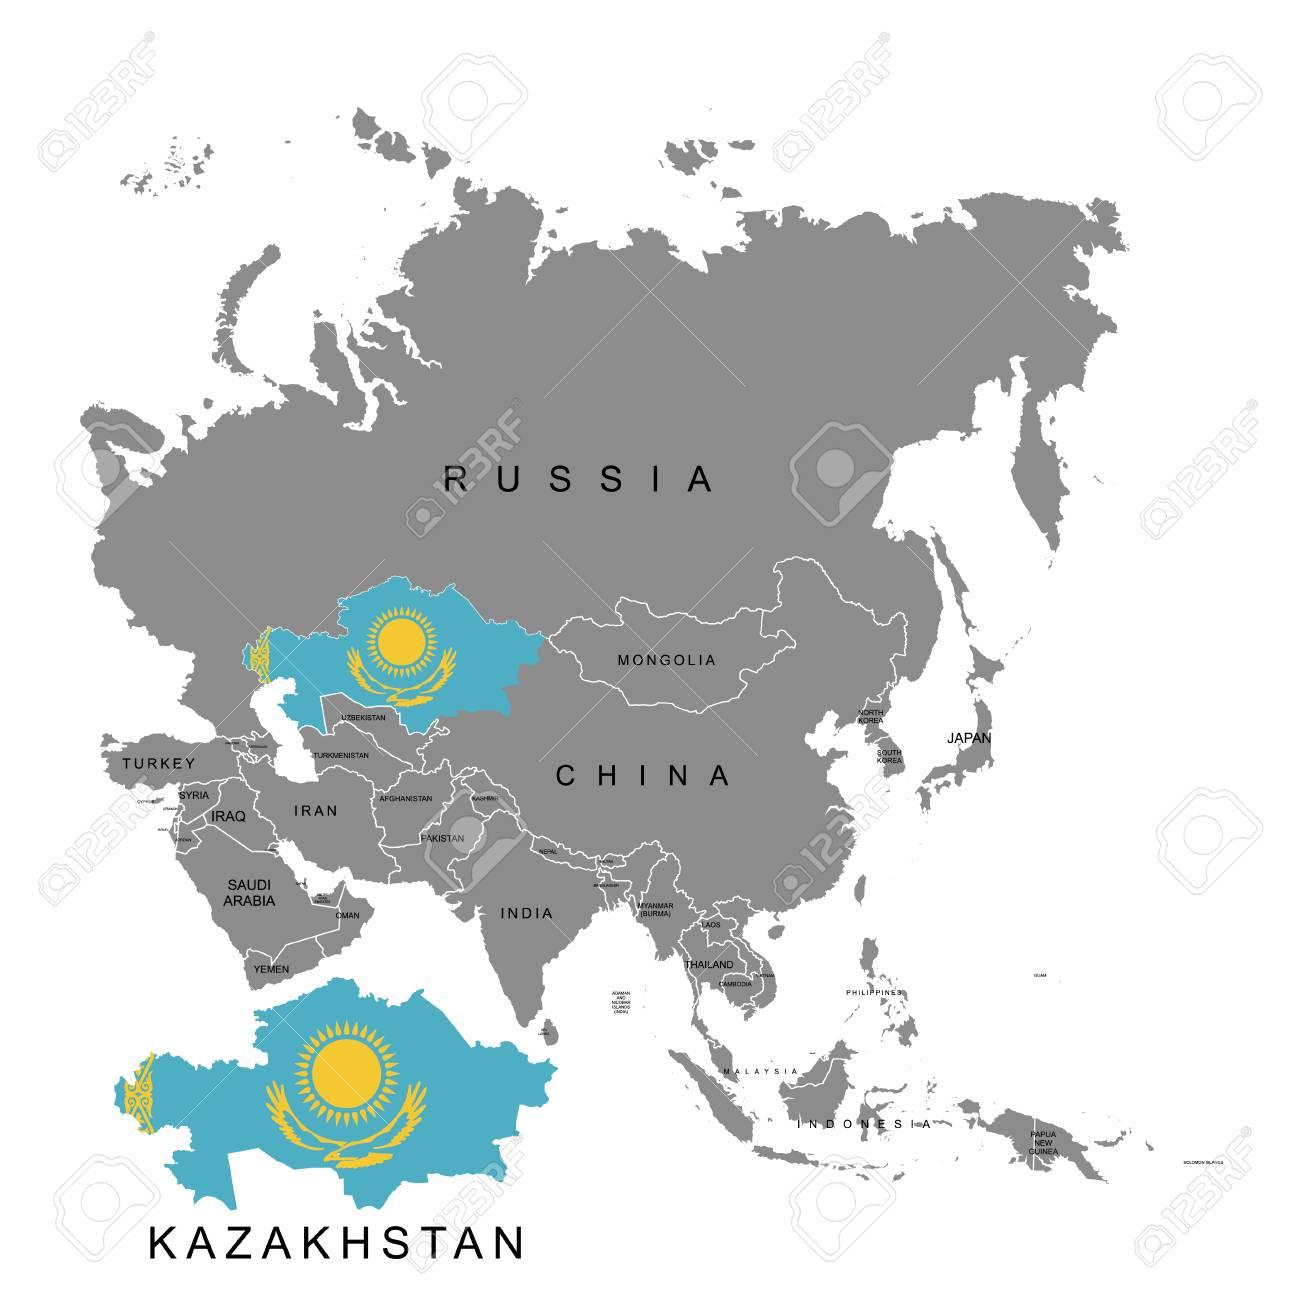 Territory of Kazakhstan on Asia continent. Flag of Kazakhstan... on map of southeast asia, map of indian ocean, map of uzbekistan, map of sri lanka, map of usa, map of nepal, map of moldova, map of canada, map of macau, map of ethiopia, map of belarus, map of northern asia, map of central asia, map of dagestan, map of azerbaijan, map of korea, map of aral sea, map of pakistan, map of kyrgyzstan, map of finland,